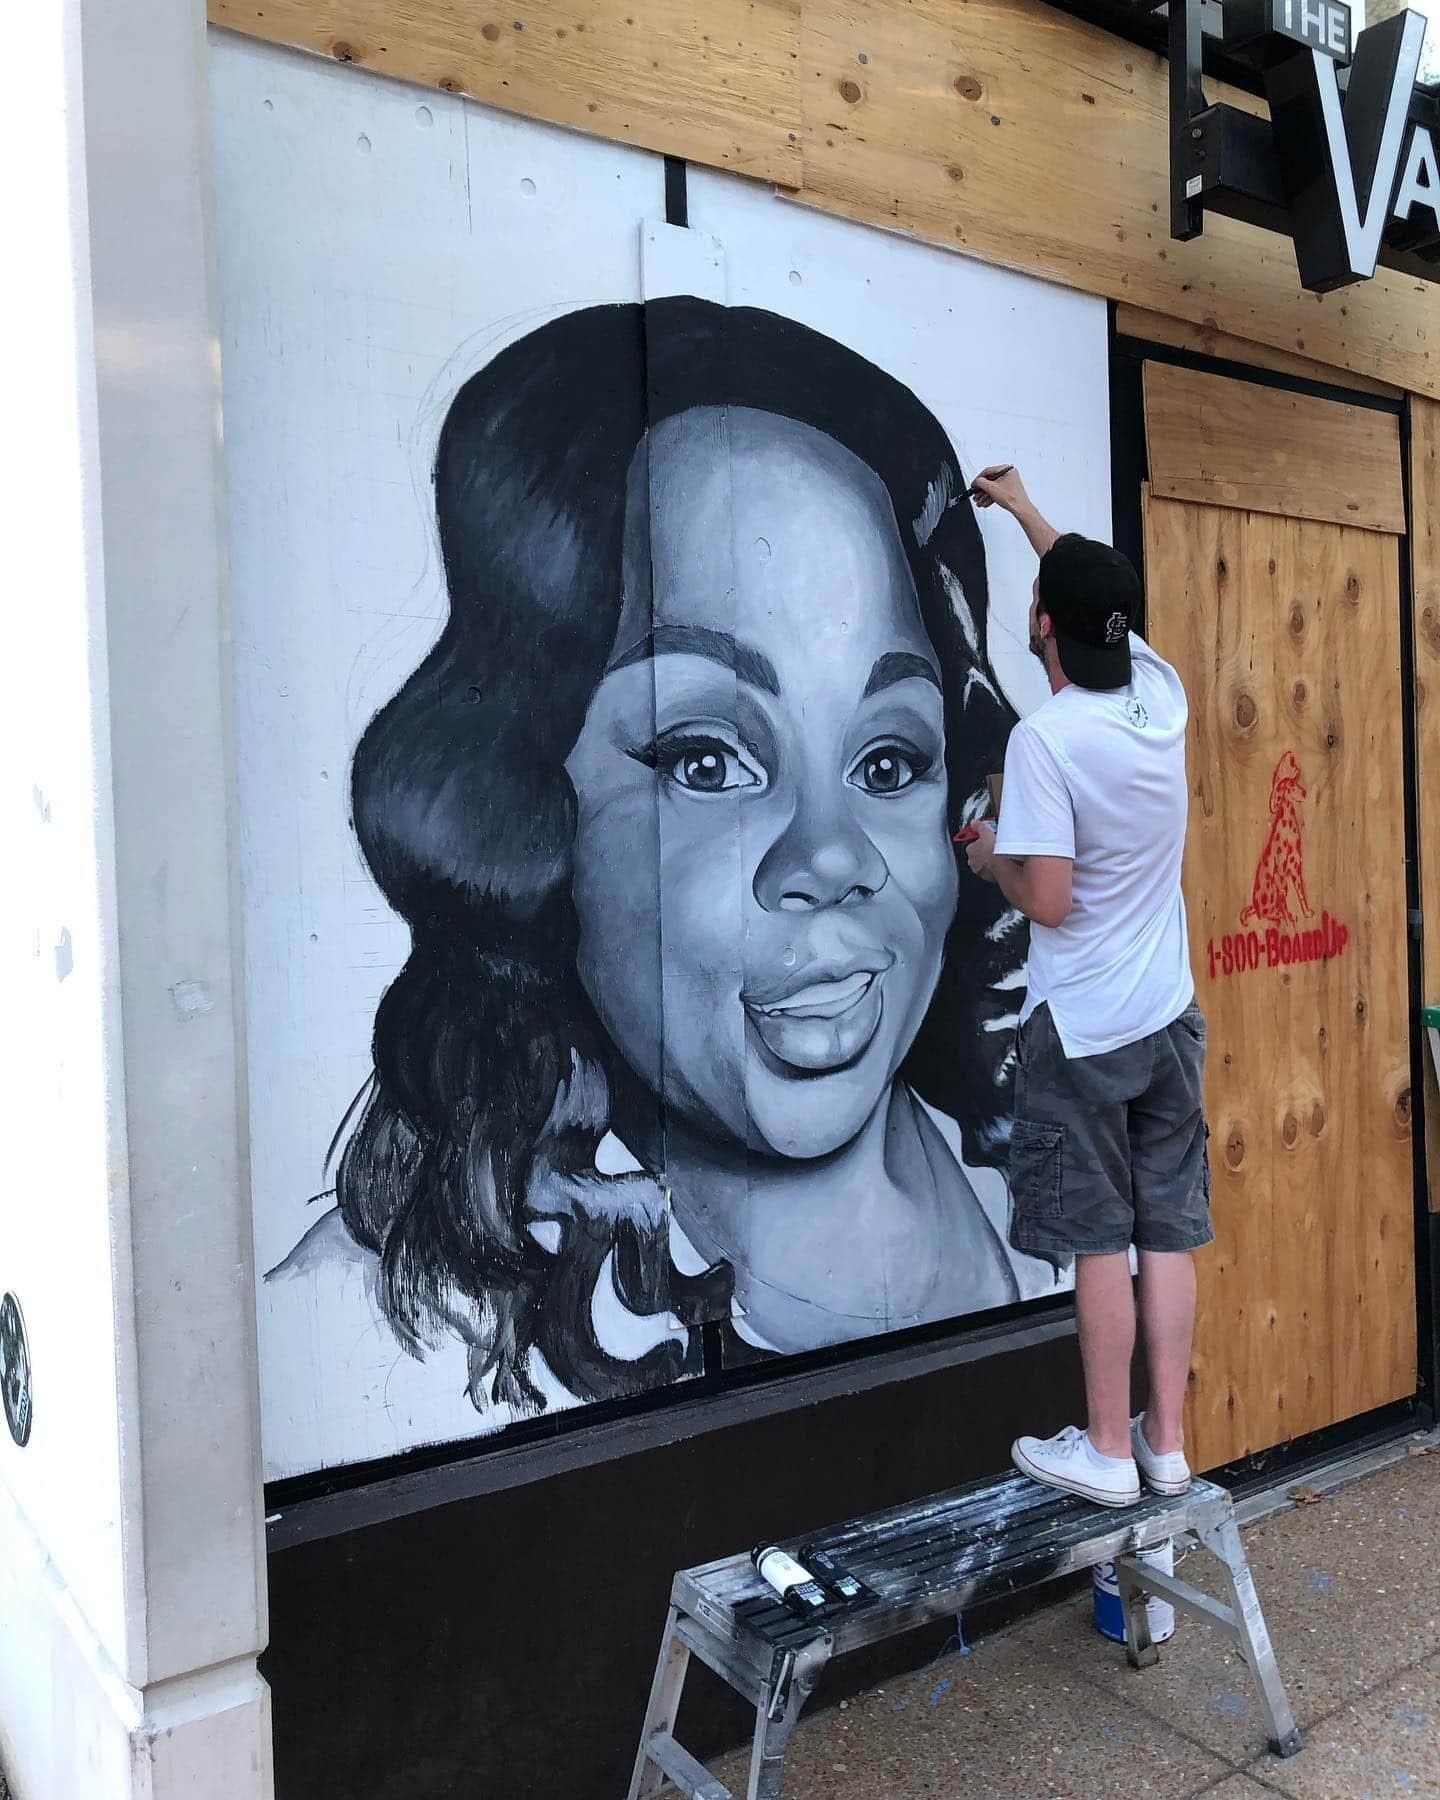 Ben Angelly Paints Breonna Taylor Mural in U City Loop